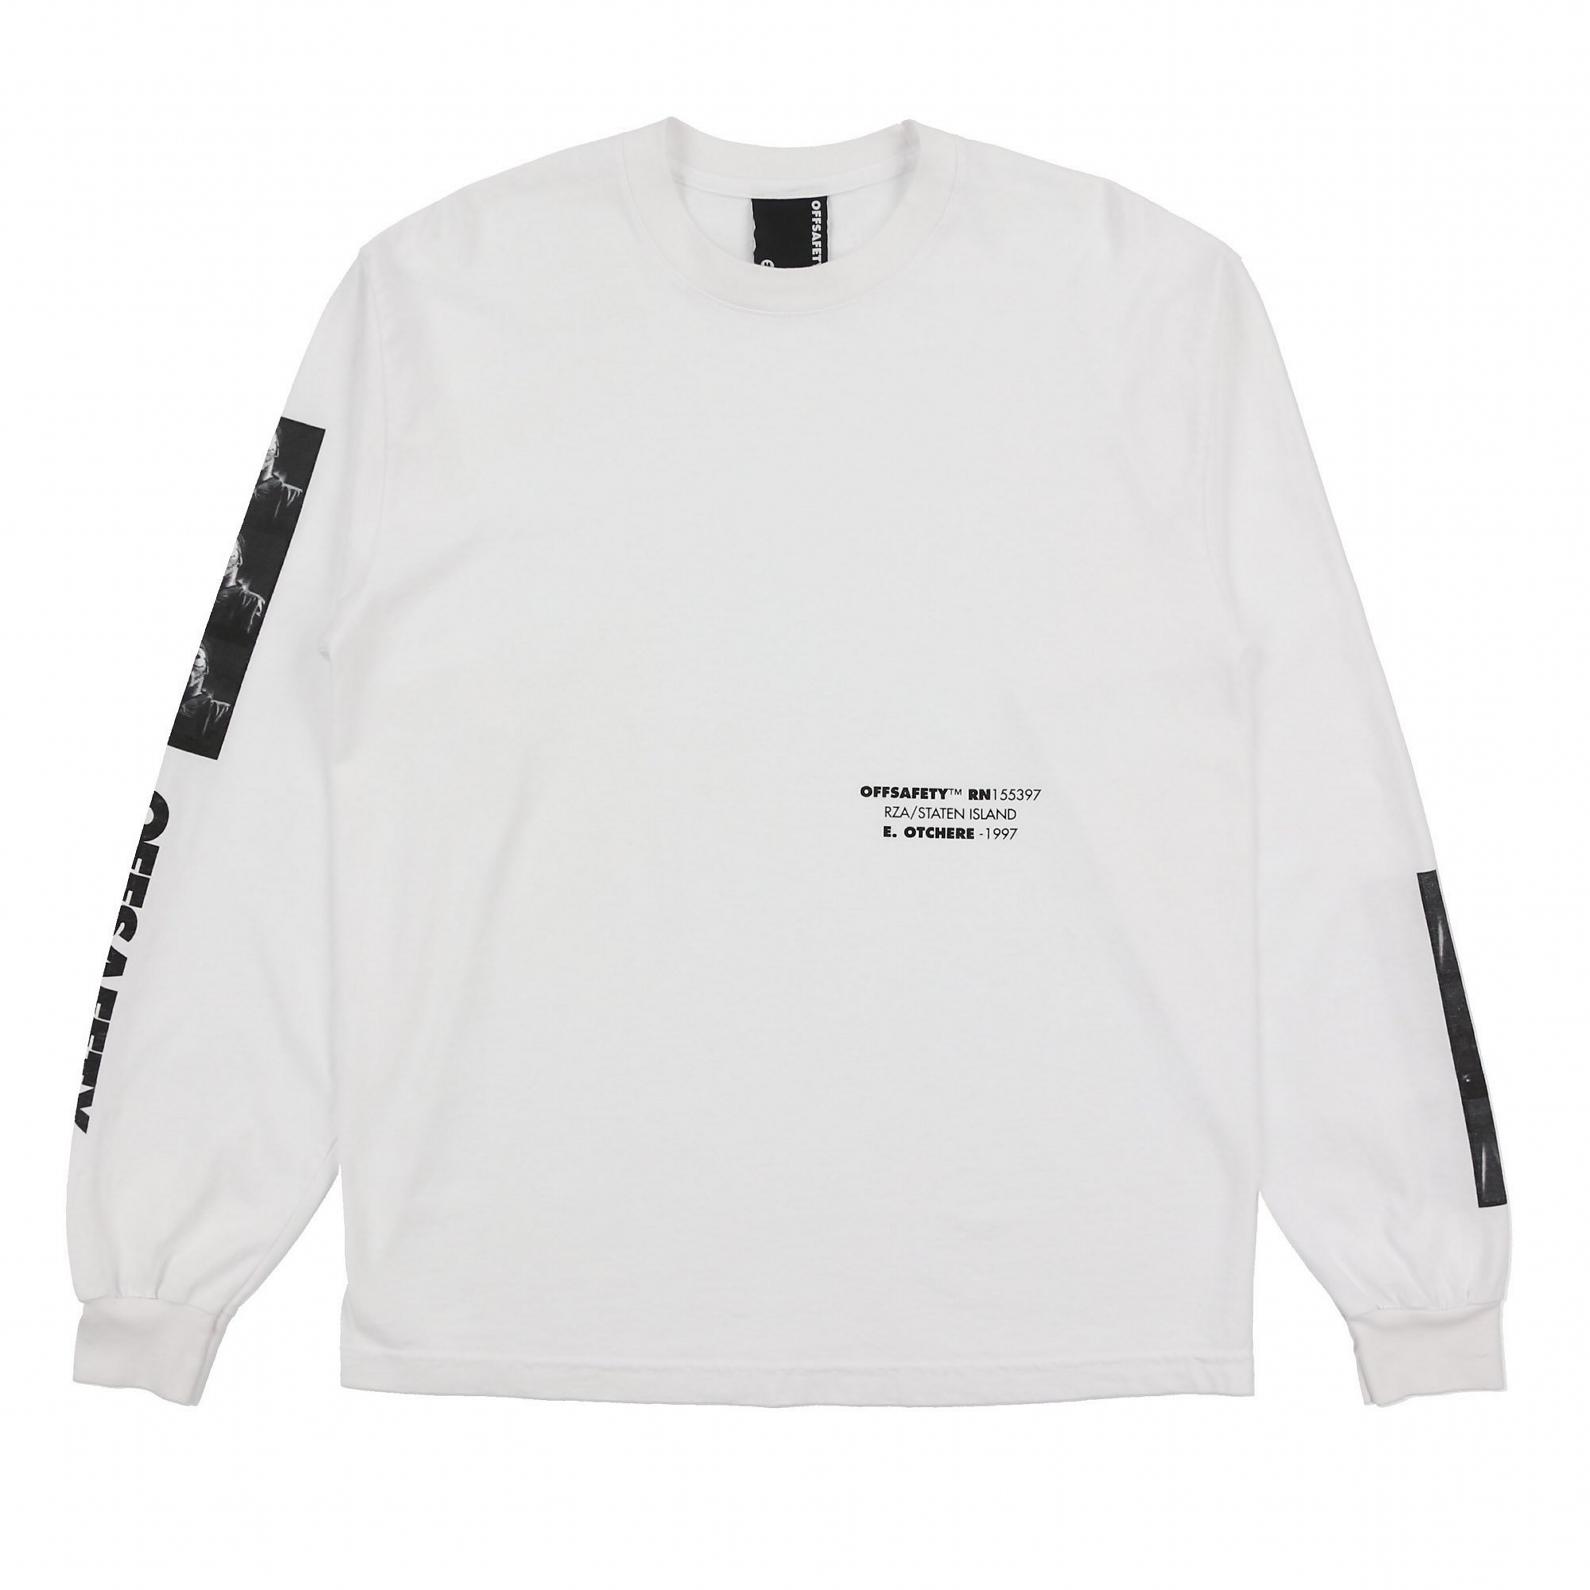 【OFF SAFETY/オフセーフティー】TRANSFORM LS TEE 長袖Tシャツ / WHITE